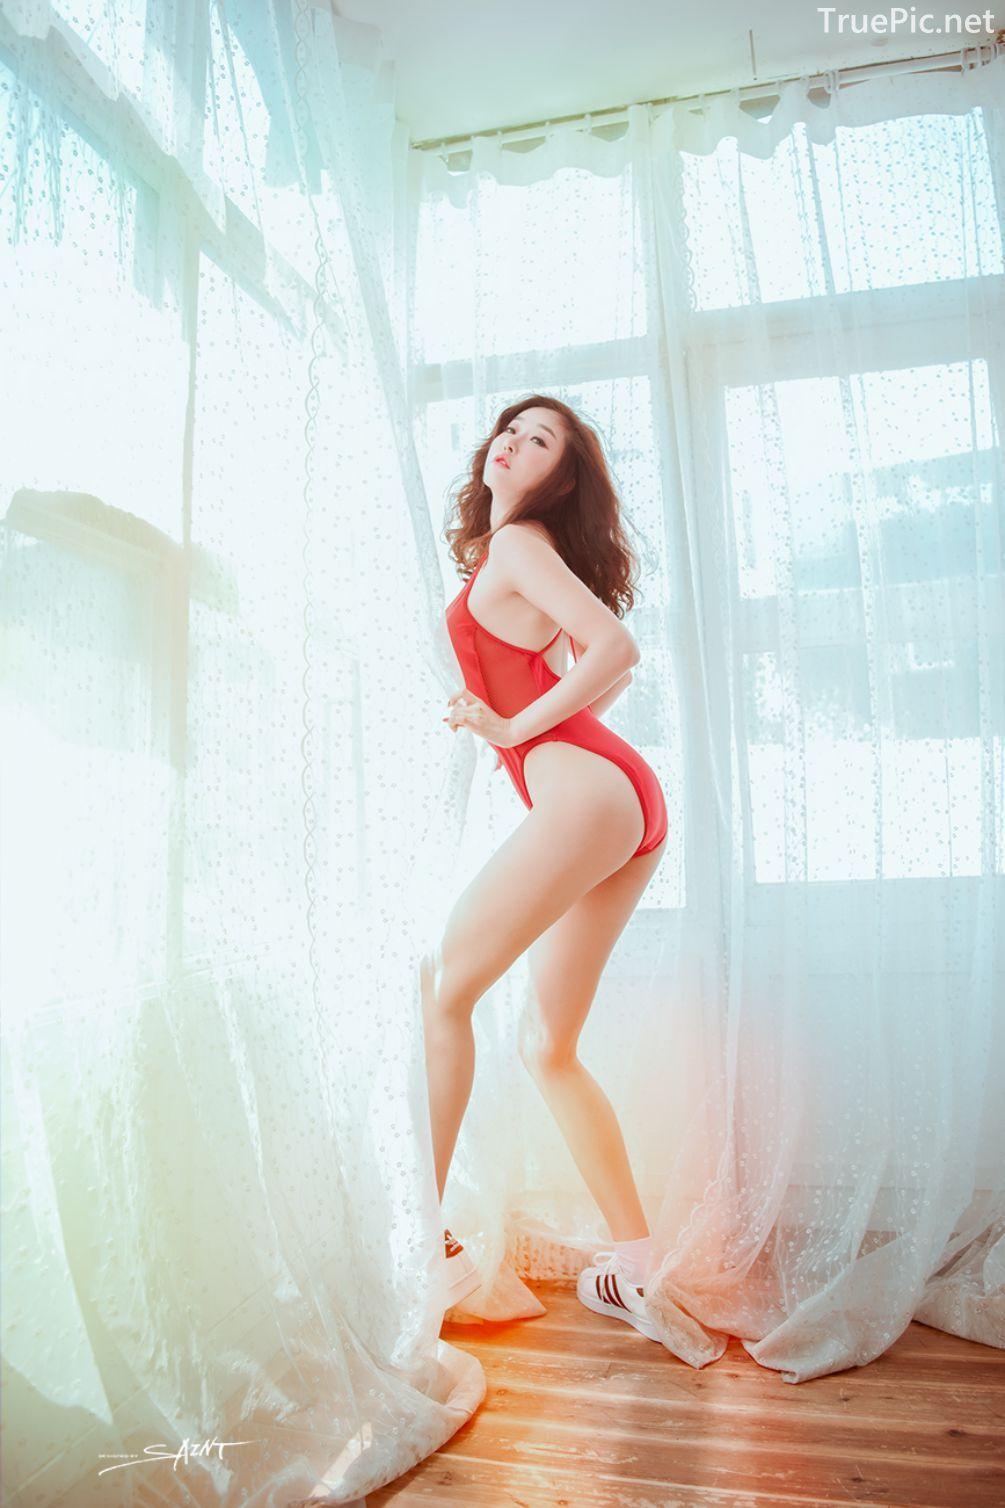 Korean-model-Oh-Haru-Sexy-Indoor-Photoshoot-Collection-TruePic.net- Picture-3